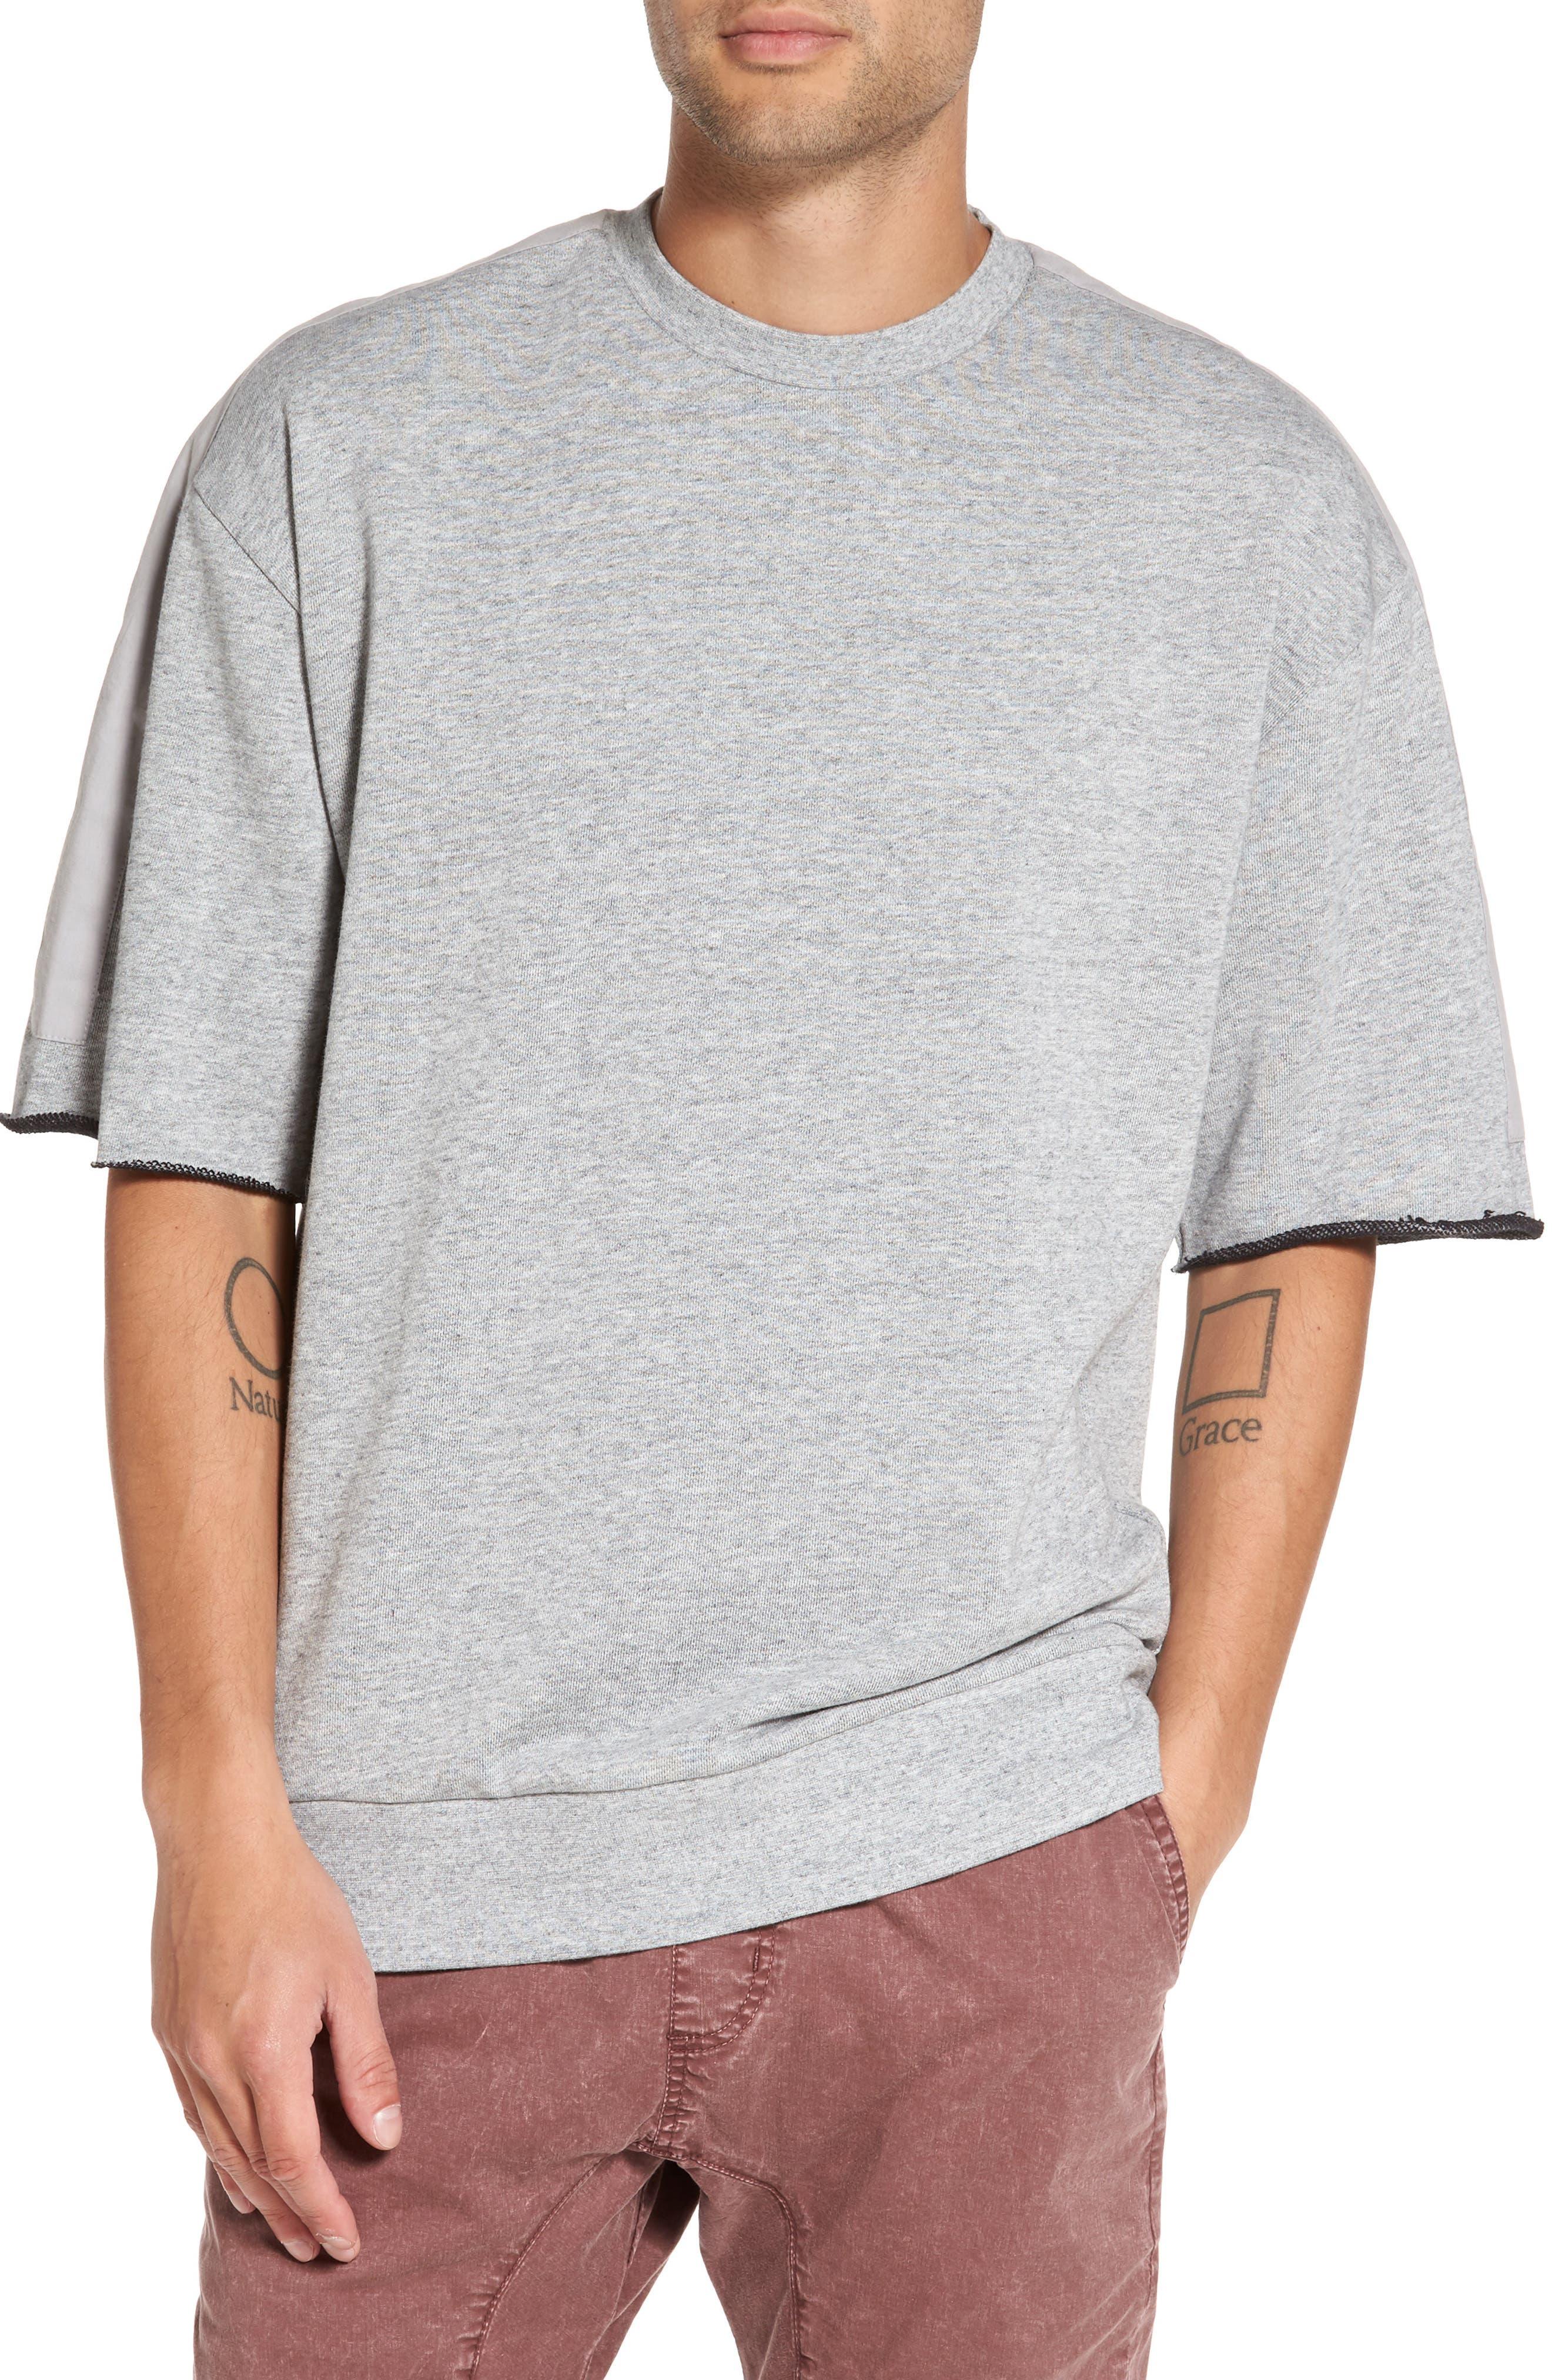 Alternate Image 1 Selected - ZANEROBE Rugger Oversize Half Sleeve Sweatshirt